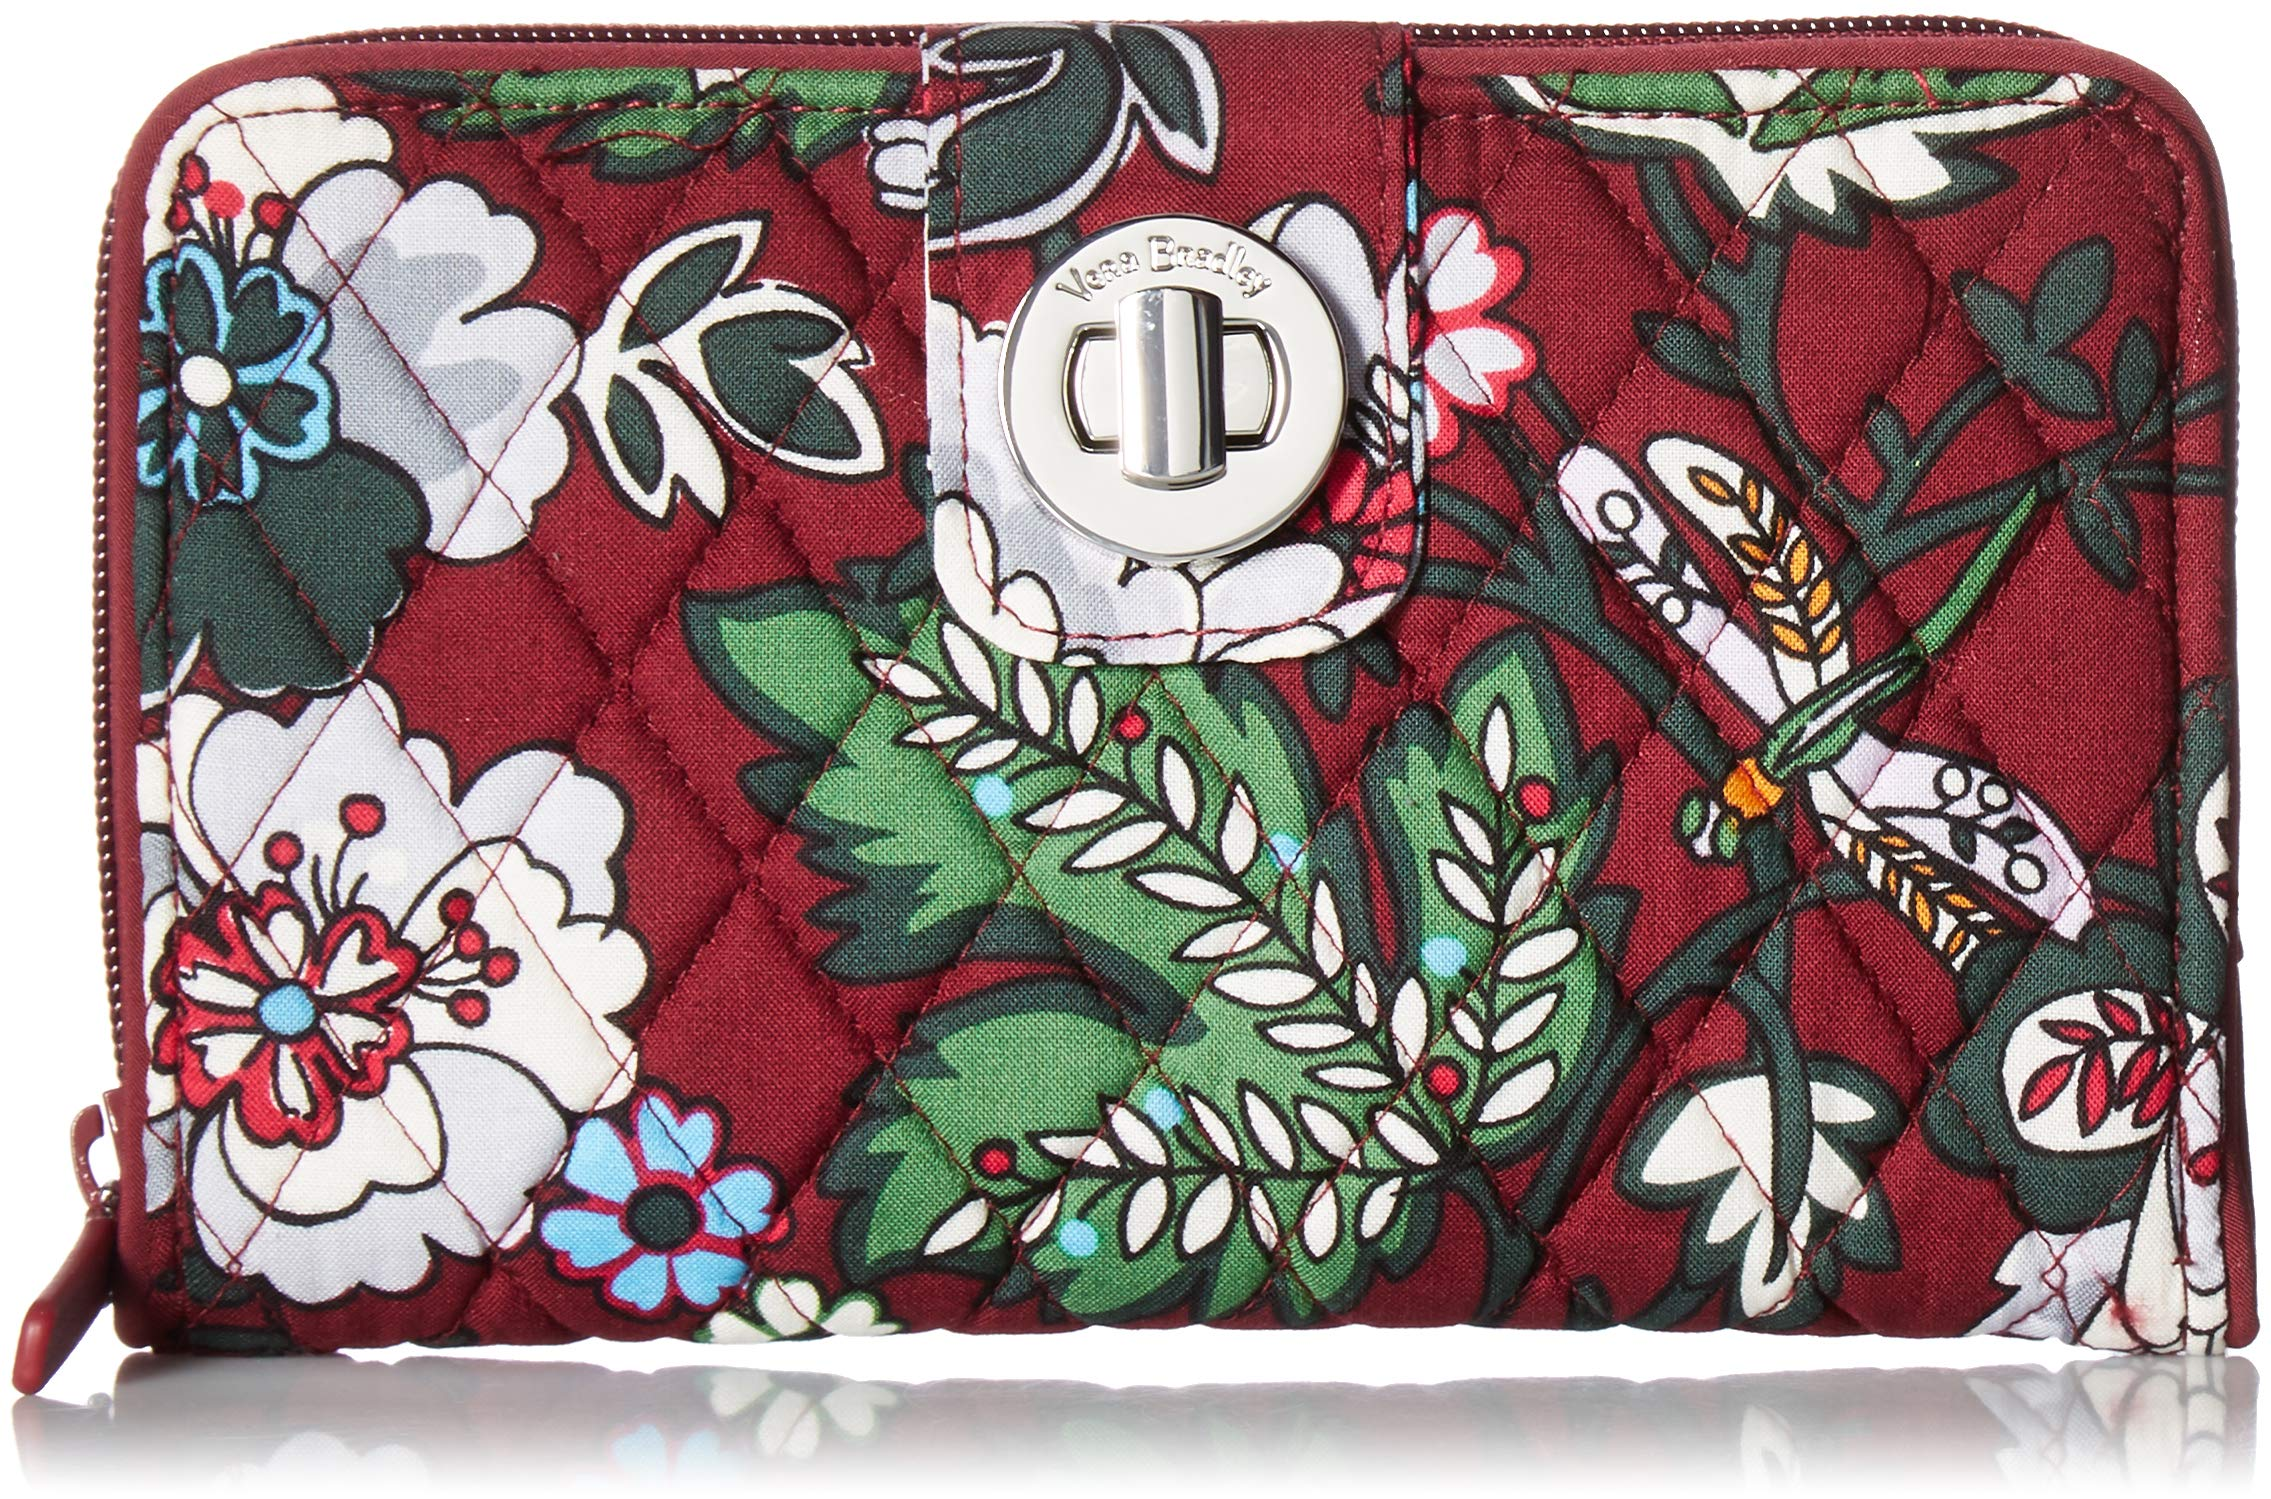 Vera Bradley RFID Turnlock Wallet,  Signature Cotton, One Size by Vera Bradley (Image #2)